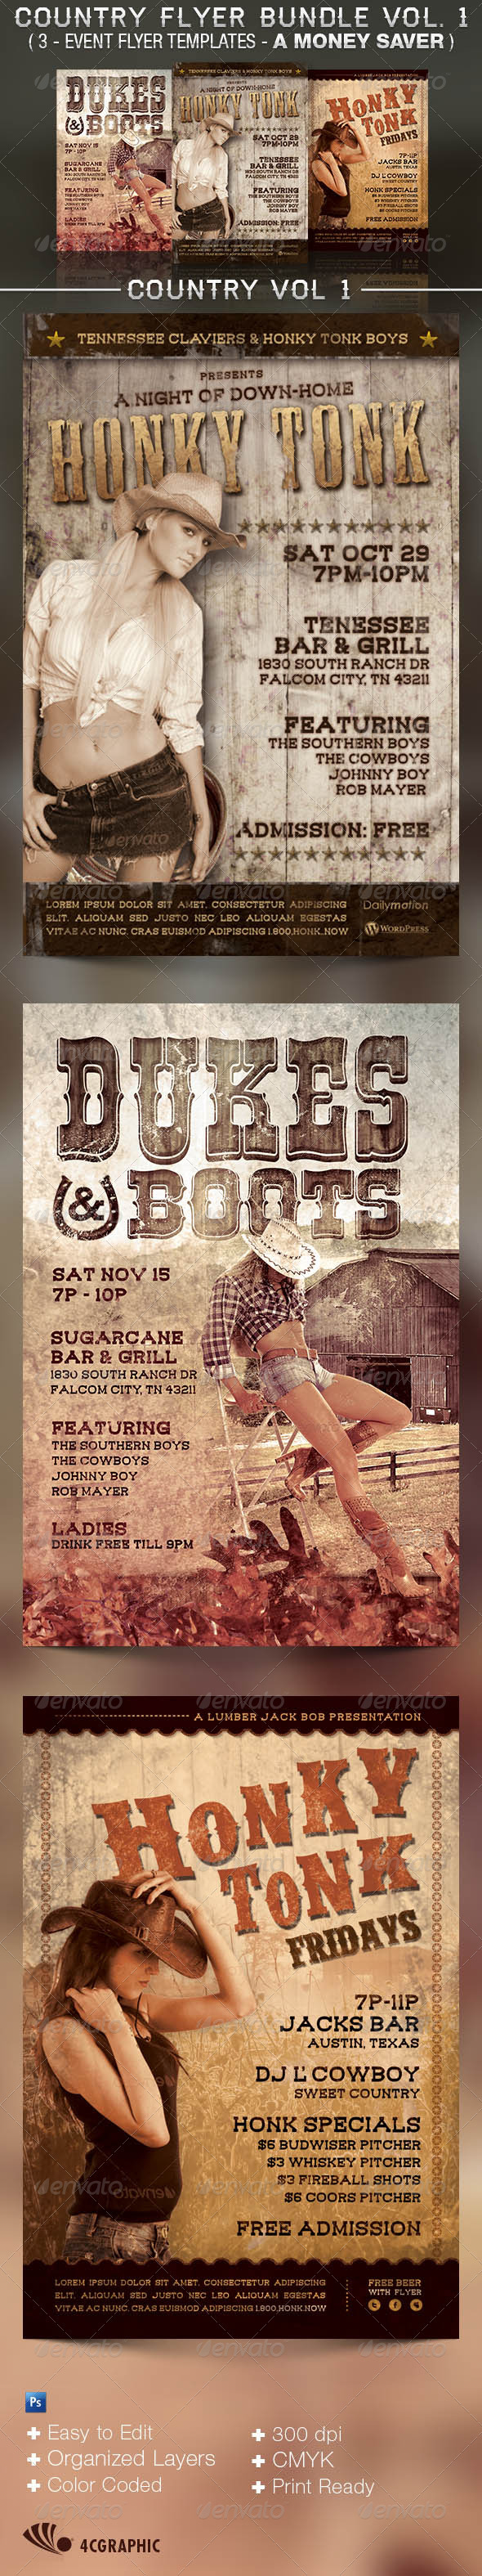 Honky Tonk Flyer Templates Bundle Vol. 1 - Clubs & Parties Events